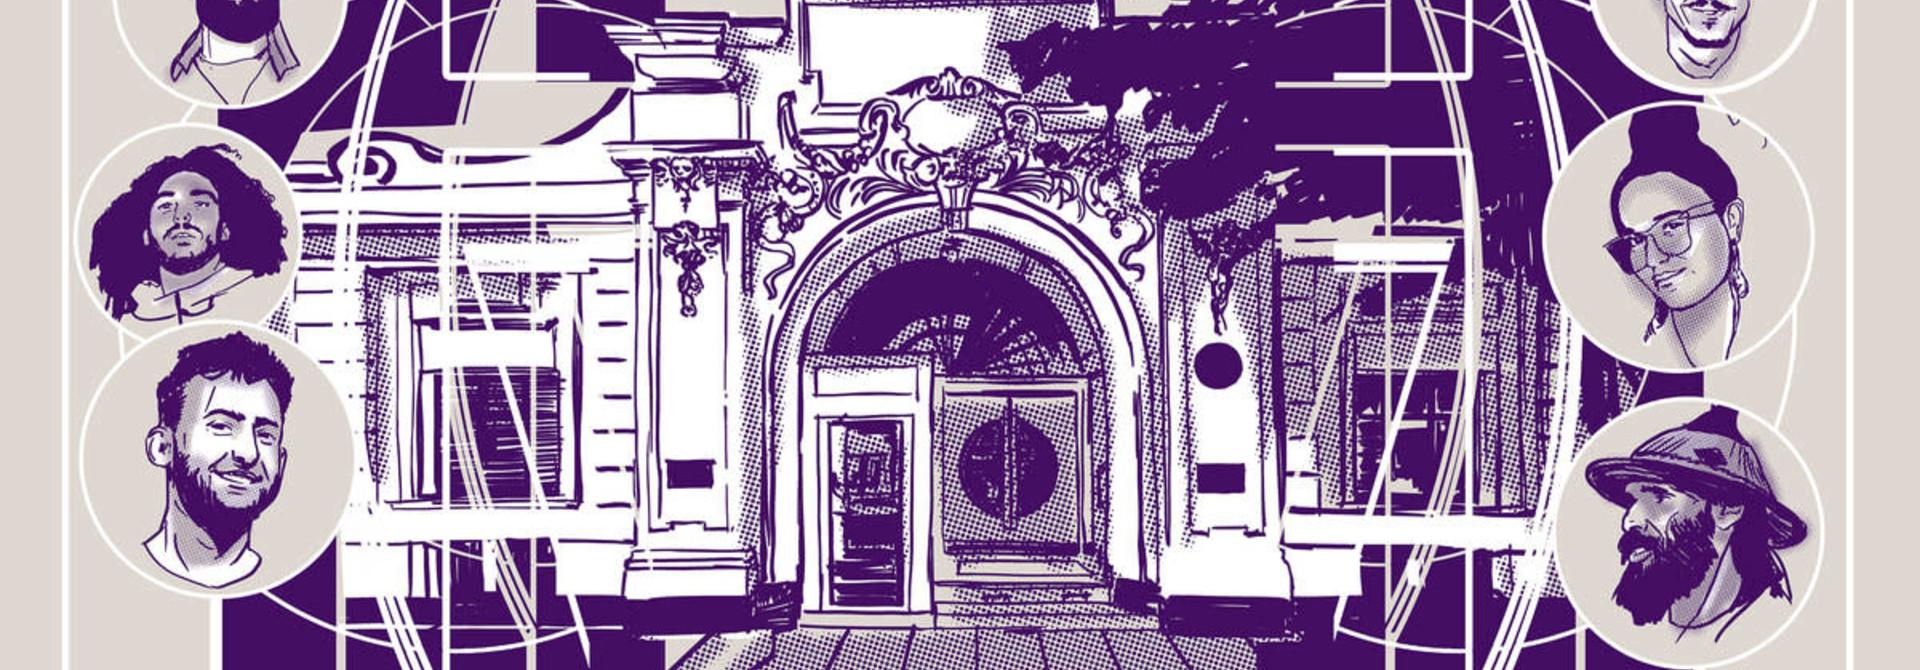 Artistes Variés • Gilles Peterson Presents: MV4